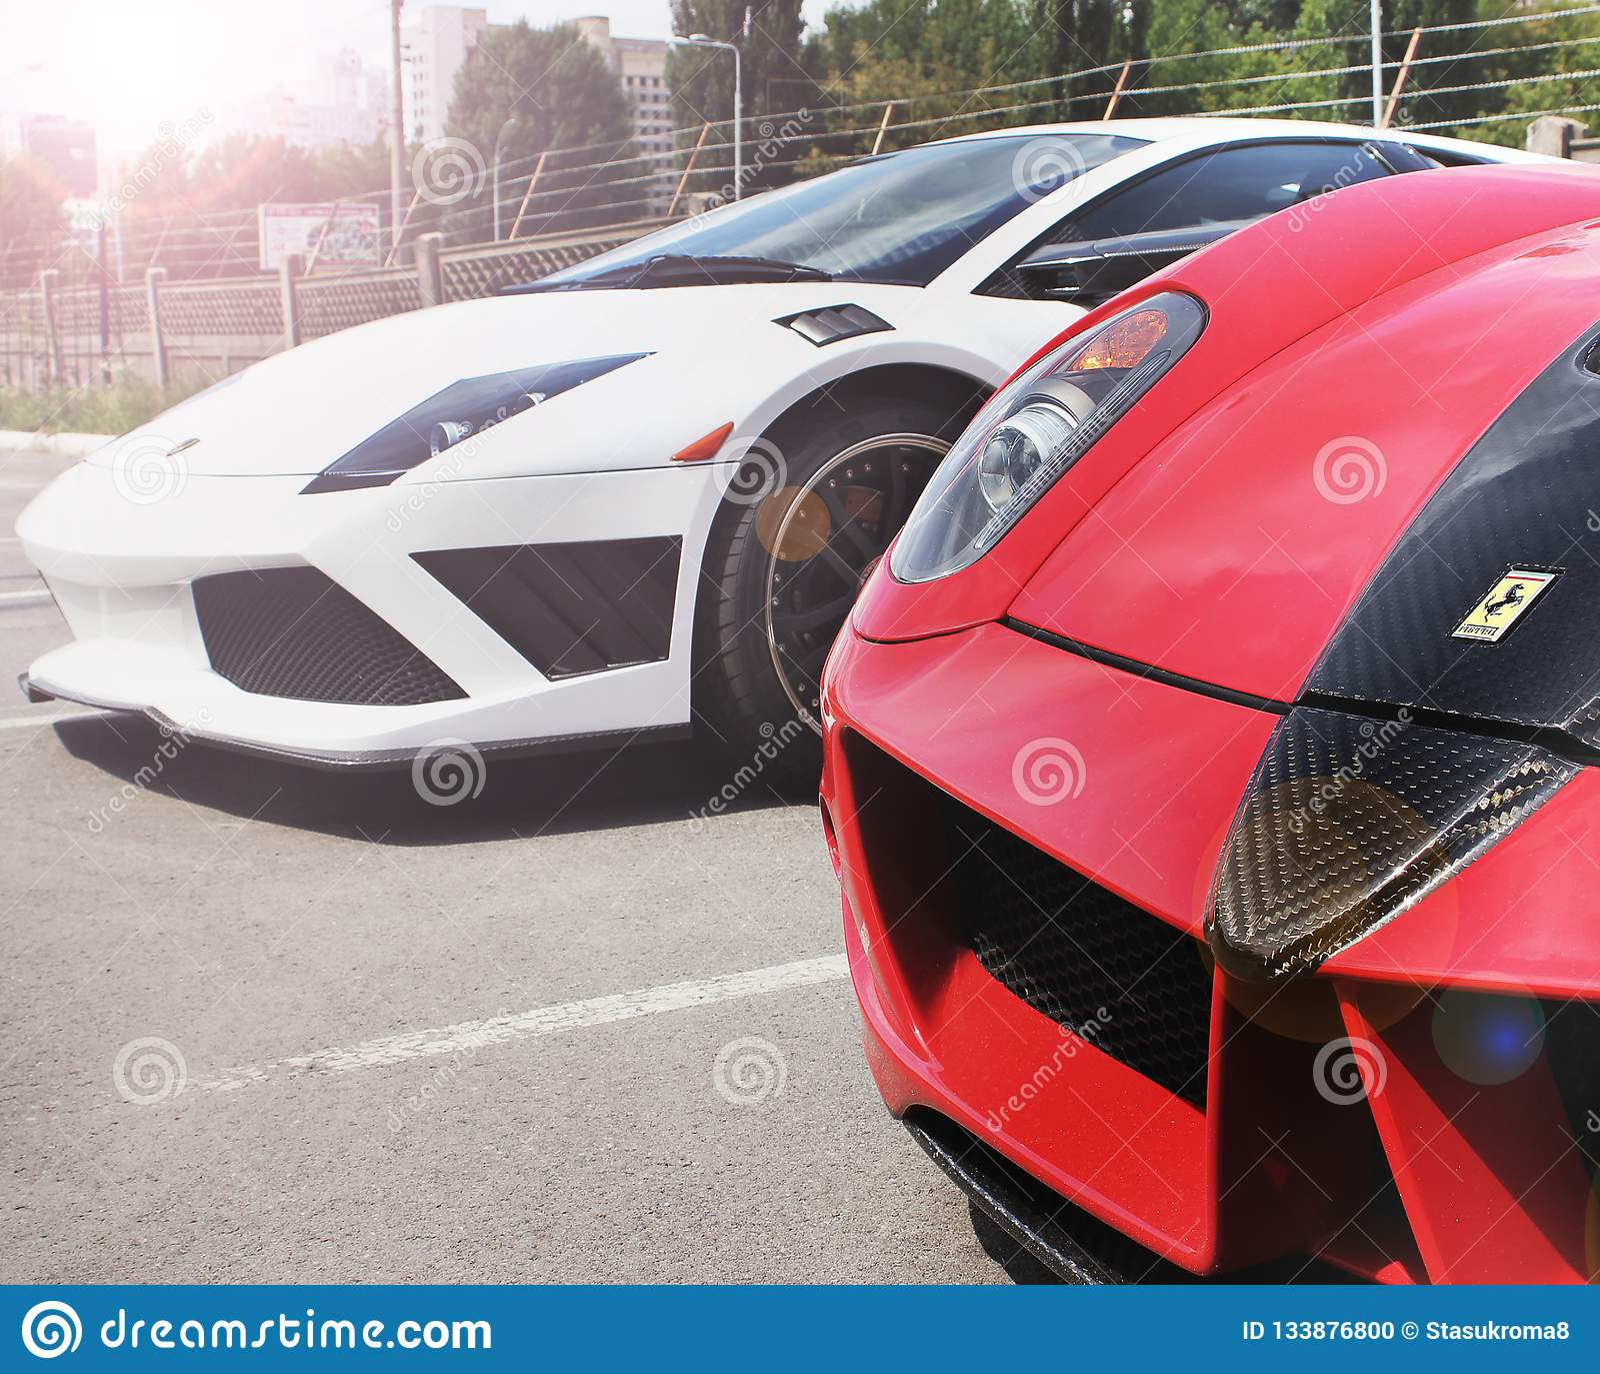 Kiew Ukraine Am 11 April 2016 Ferrari 599 Gtb Fiorano Stallone Mansory U Lamborghini Murcielago Redaktionelles Bild Bild Von Leistung Cayman 133876800